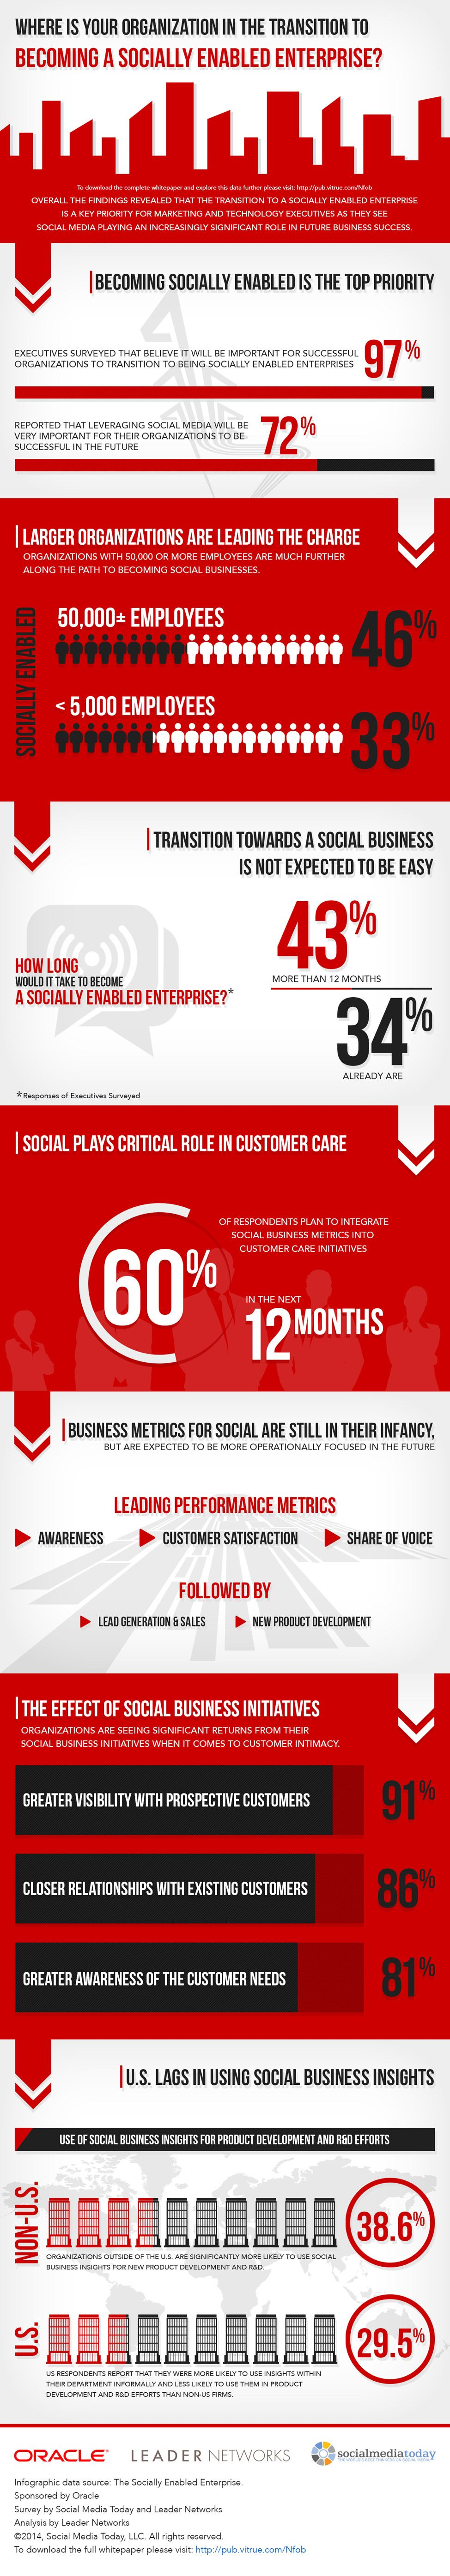 Enterprises must make social enablement a top priority - Oracle